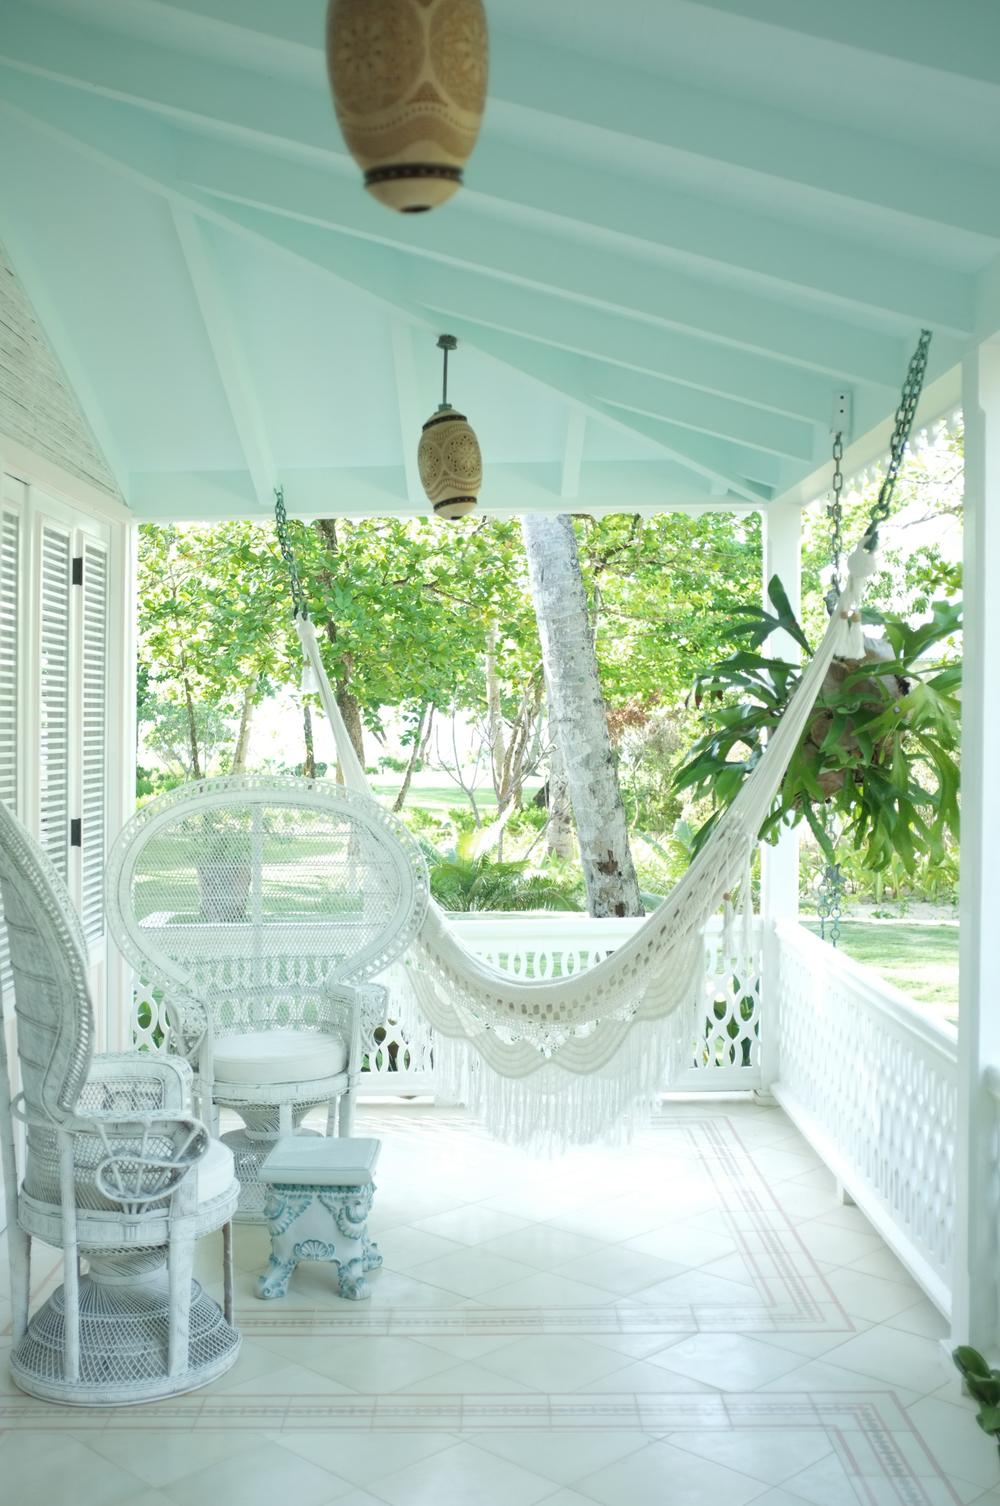 Caribbean_Dominican_Republic_Playa_Grande_1.jpg